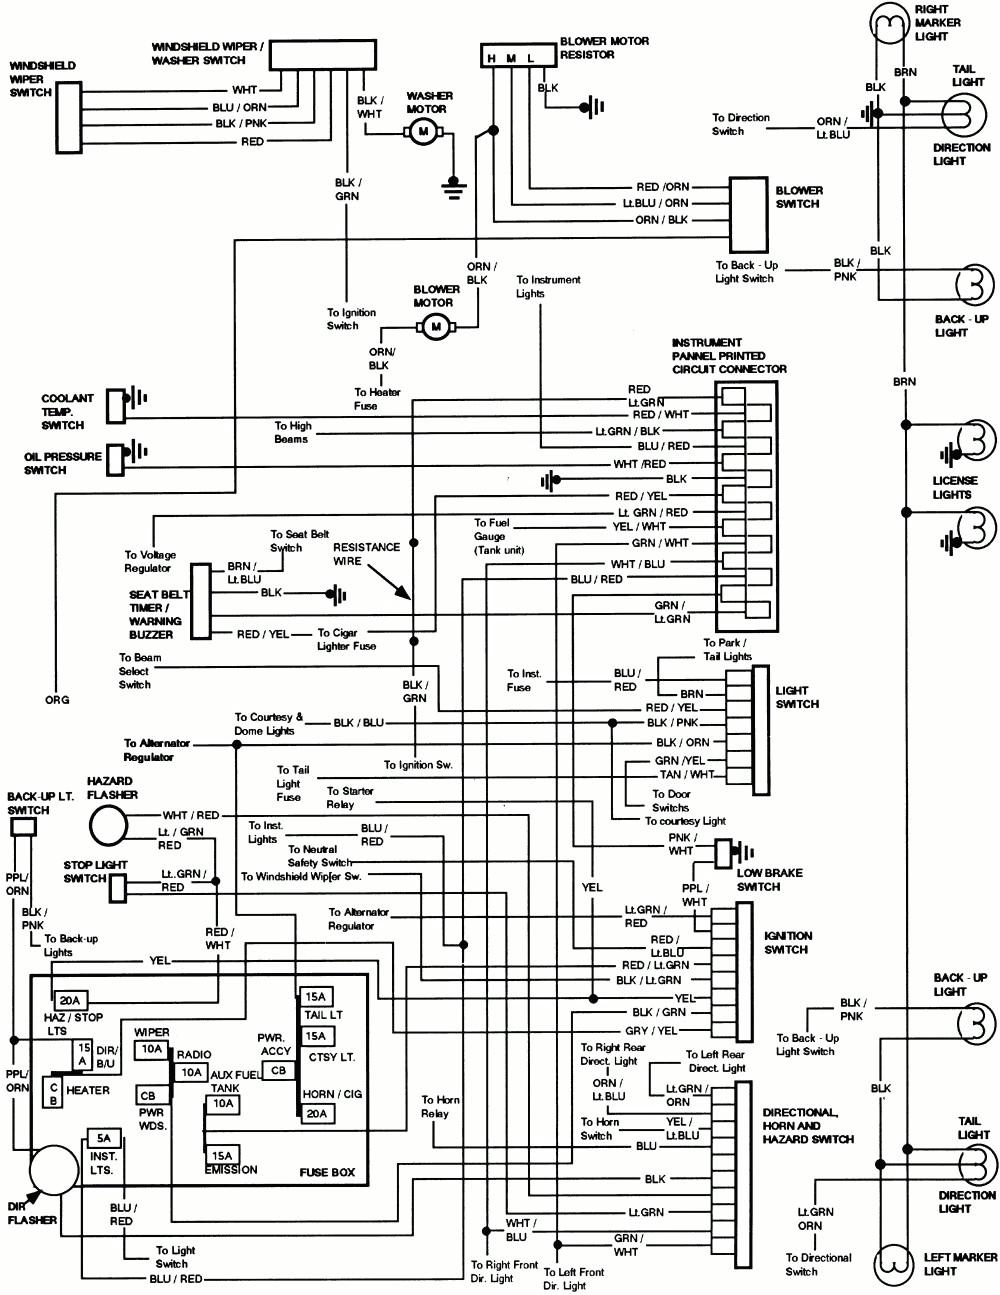 1994 ford f 150 starter wiring diagram wiring diagram1994 ford f 150 starter wiring diagram